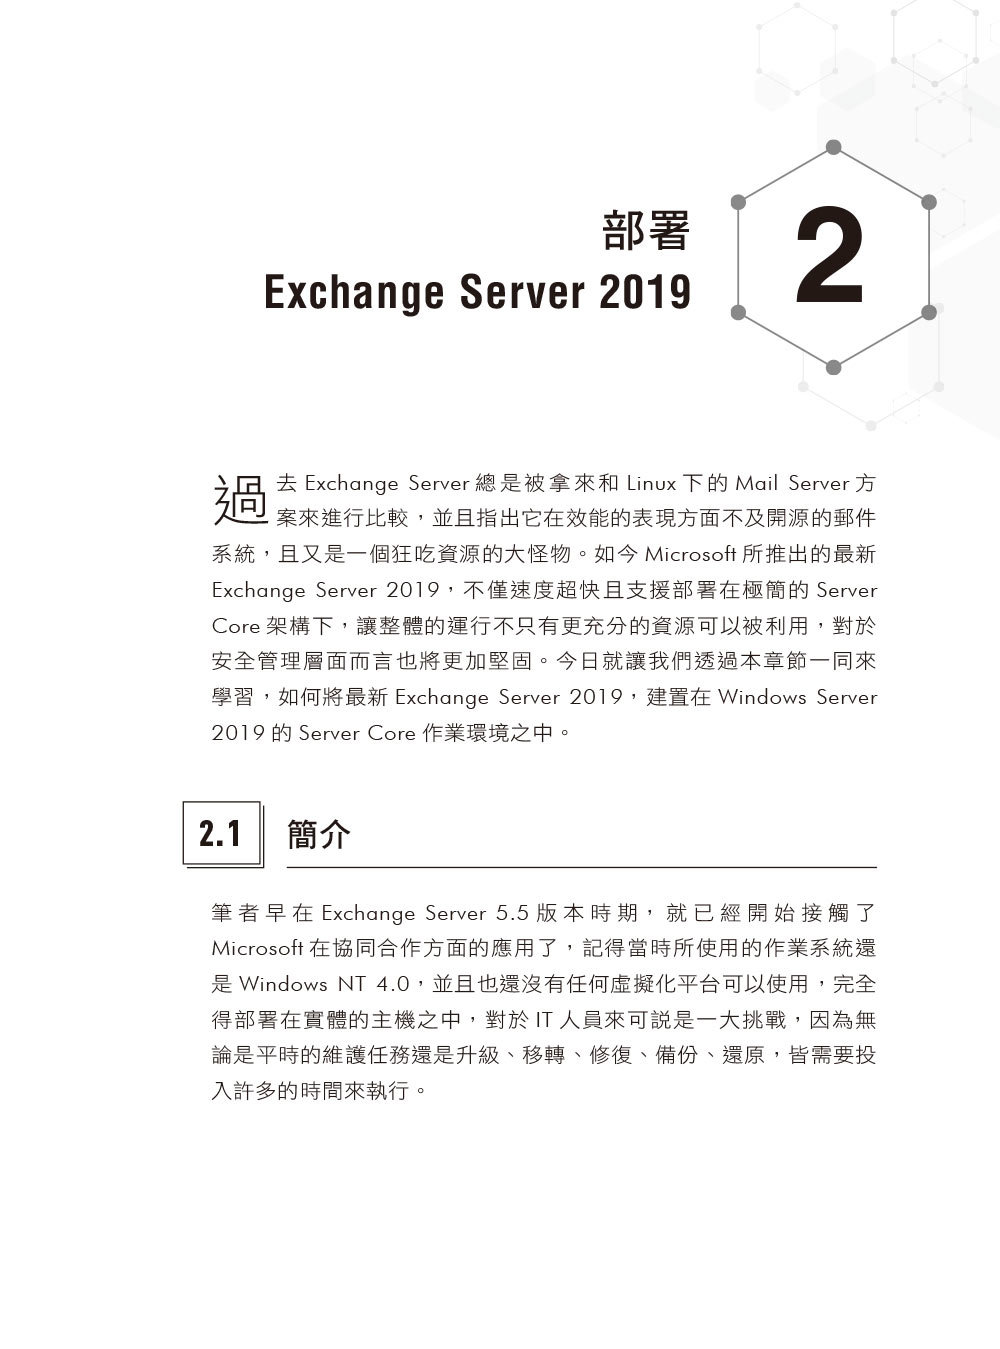 Exchange Server 2019 工作現場實戰寶典|基礎建置x進階管理x資訊安全管理-preview-1